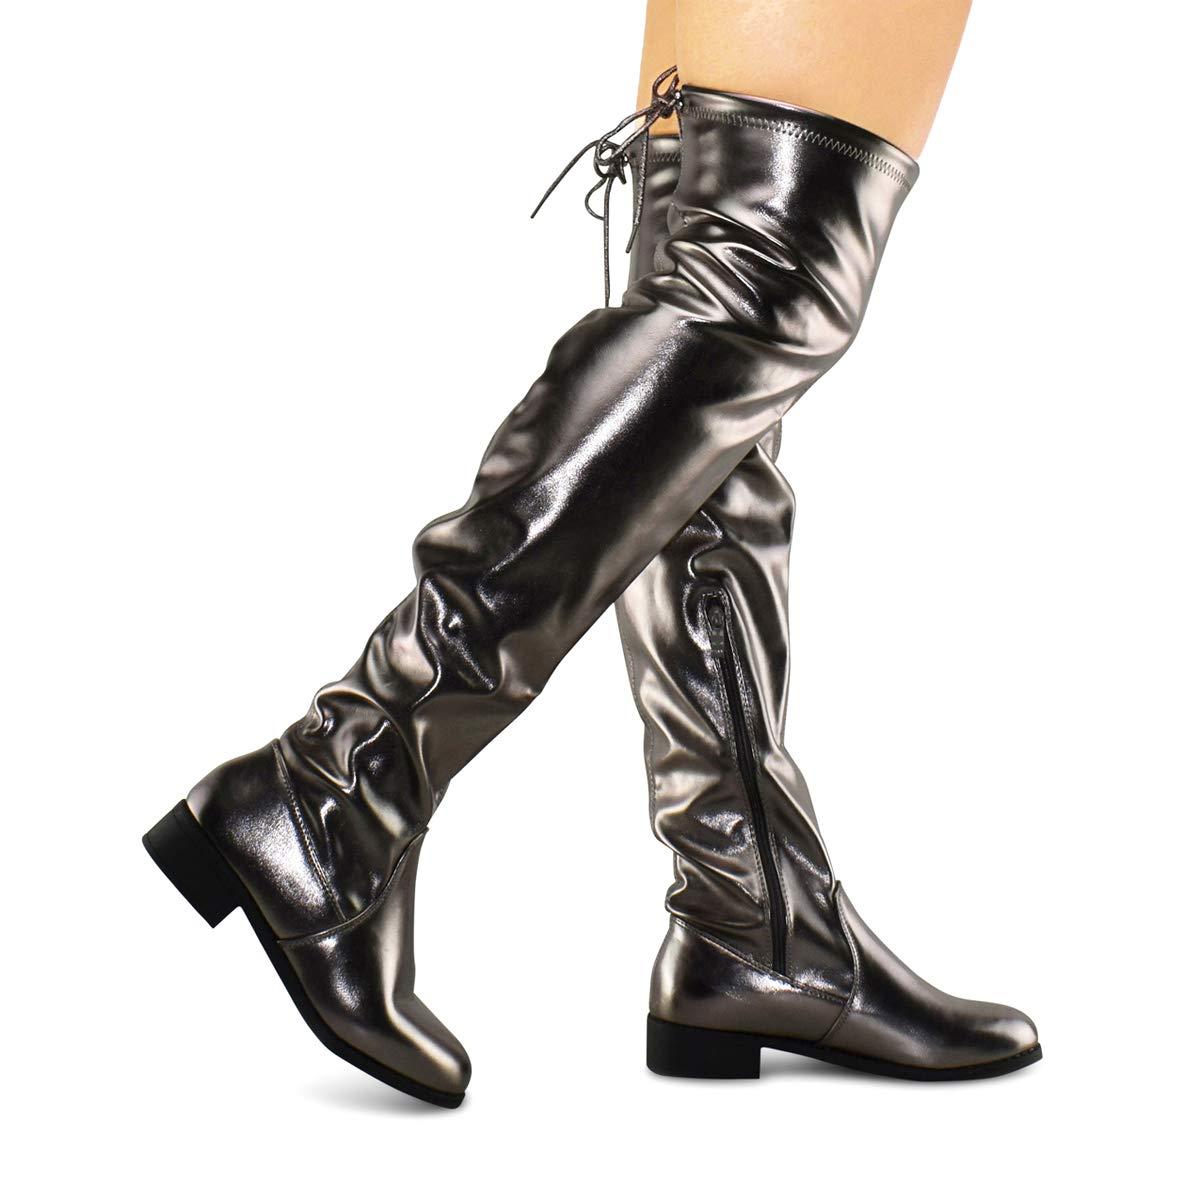 ef8d31302dc Premier Standard Women s Fashion Comfy Vegan Suede Block Heel Side ...